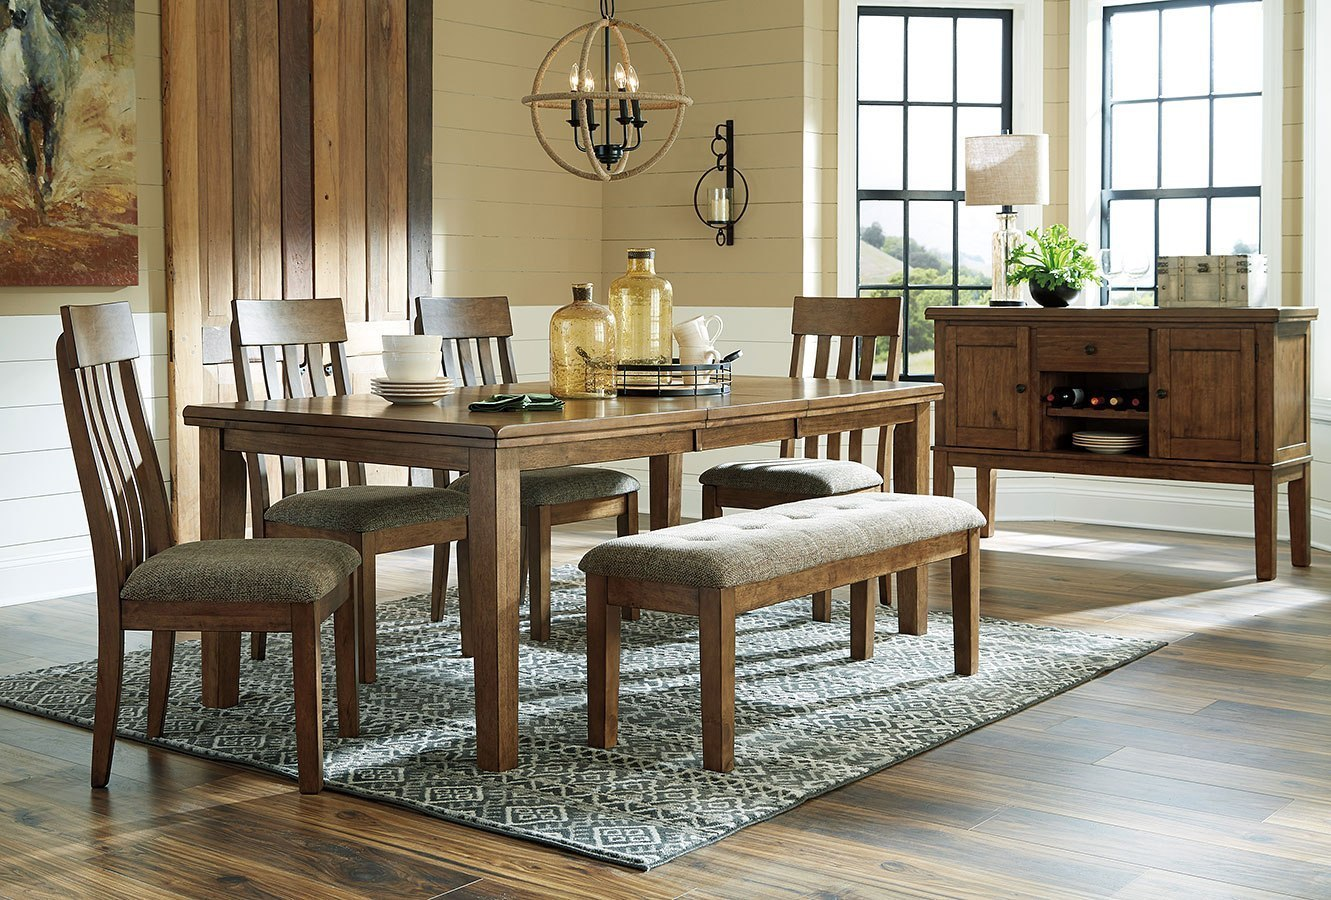 Flaybern Dining Room Set w/ Bench